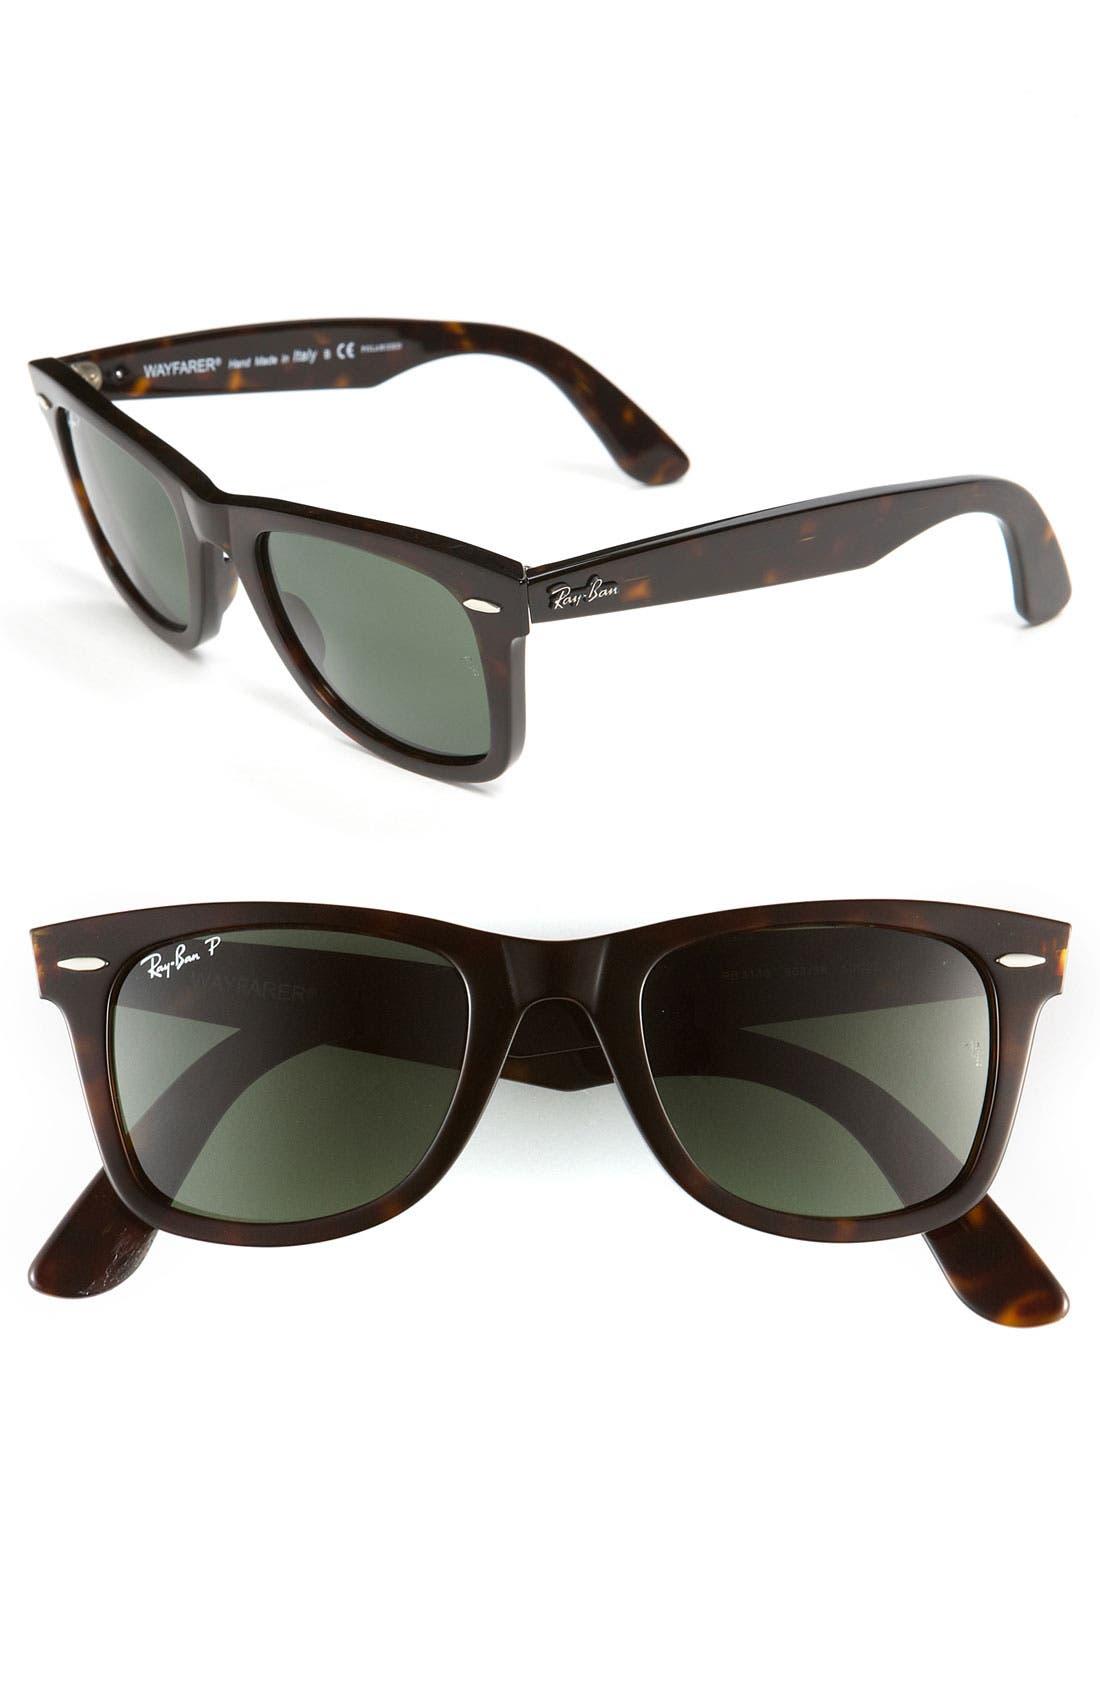 Main Image - Ray-Ban Standard Classic Wayfarer 50mm Polarized Sunglasses